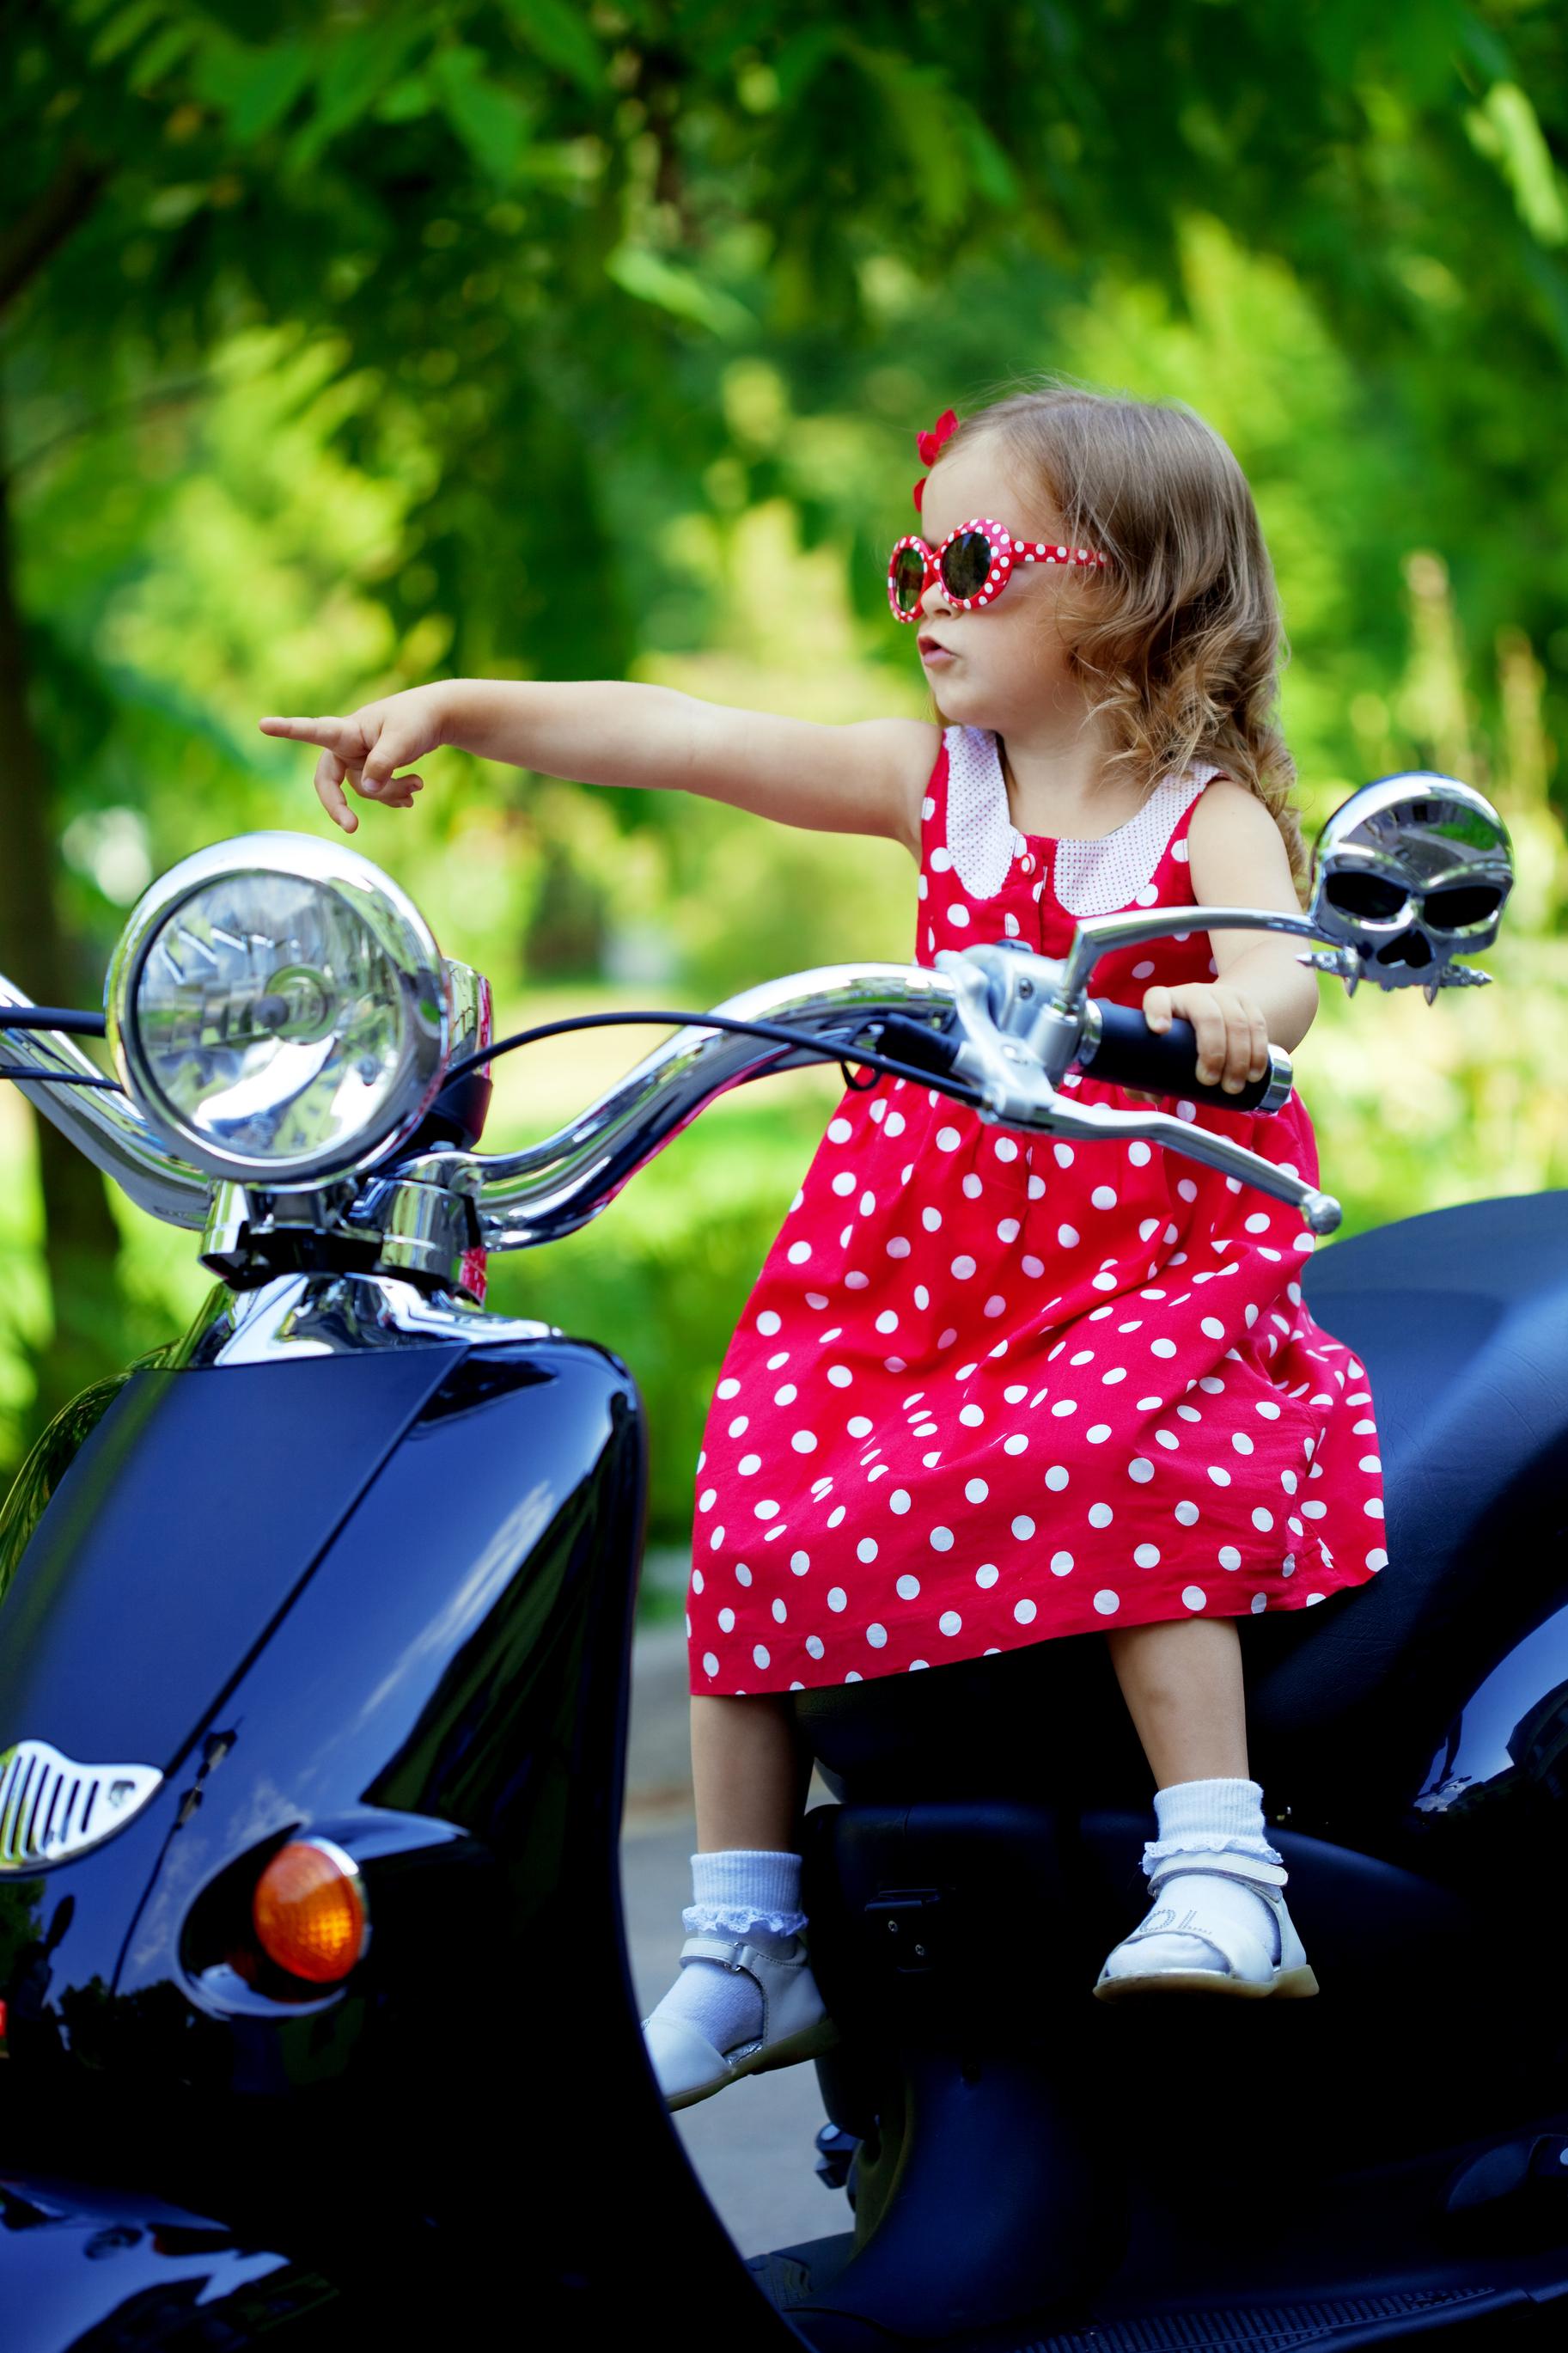 RI Motorcycle Insurance